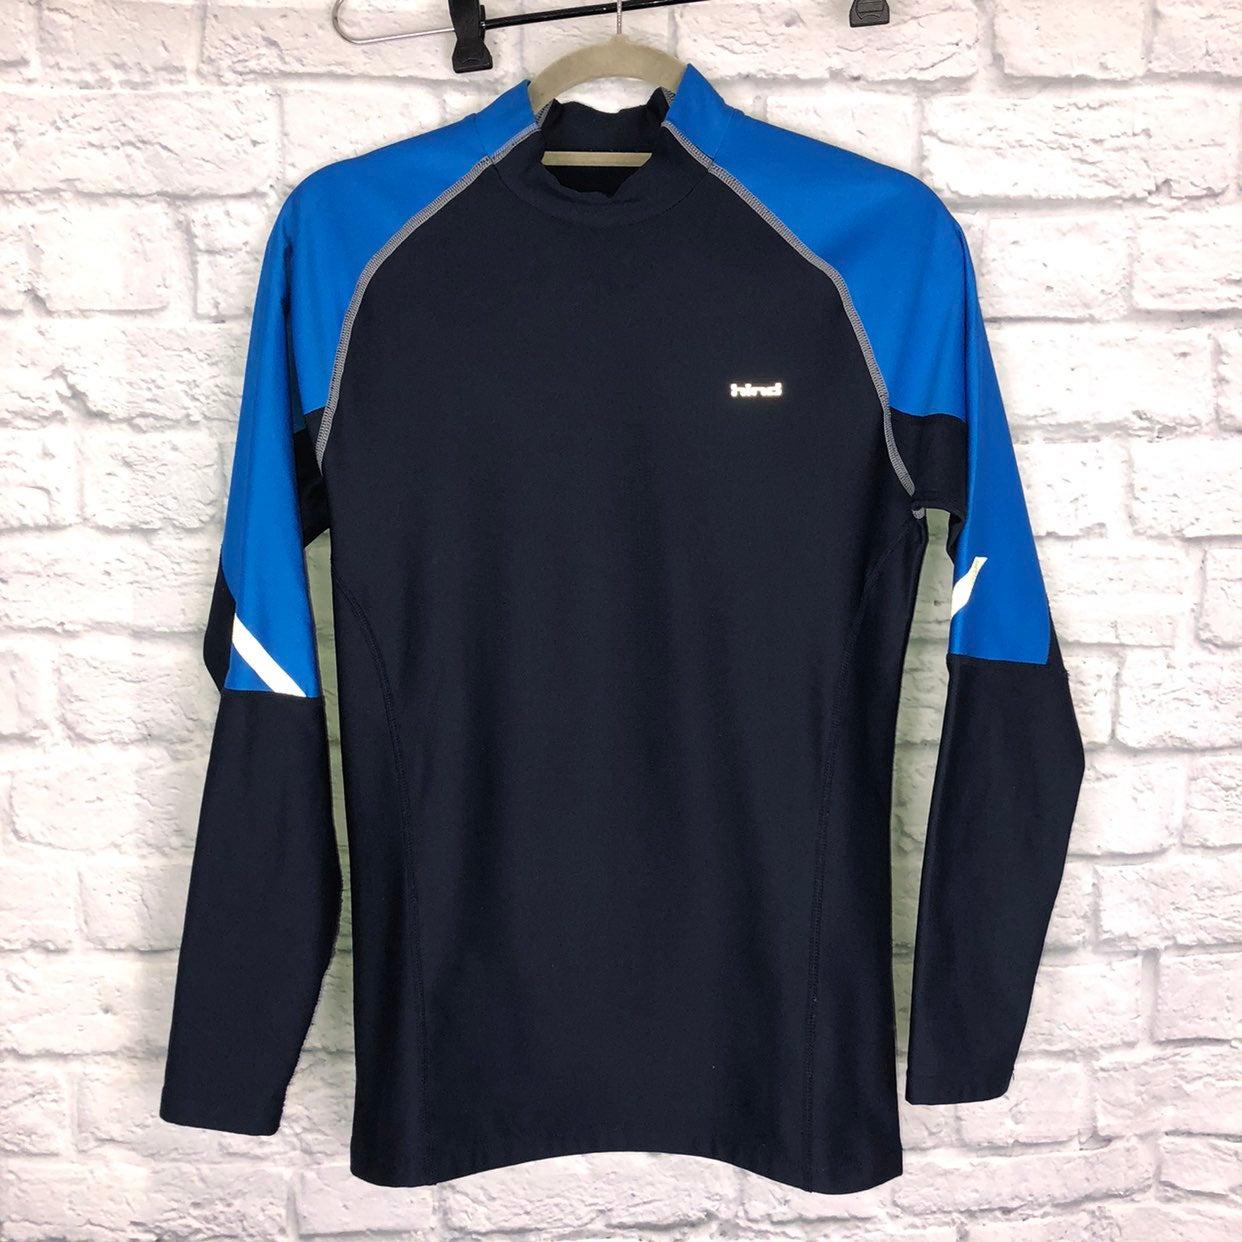 Hind mens dri fit running shirt sz small